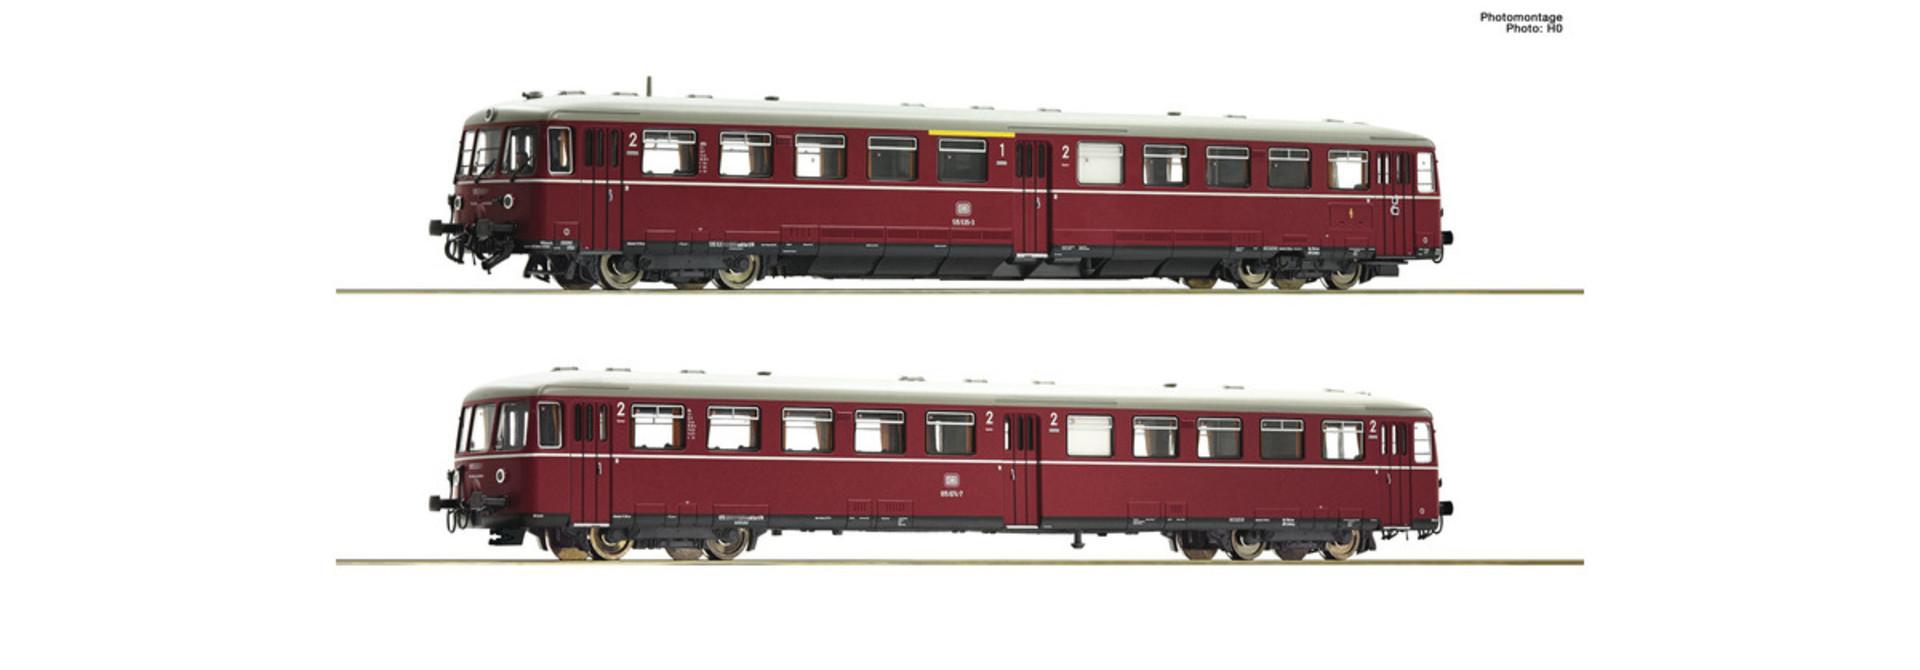 740100 Akku-Triebzug BR 515 rot